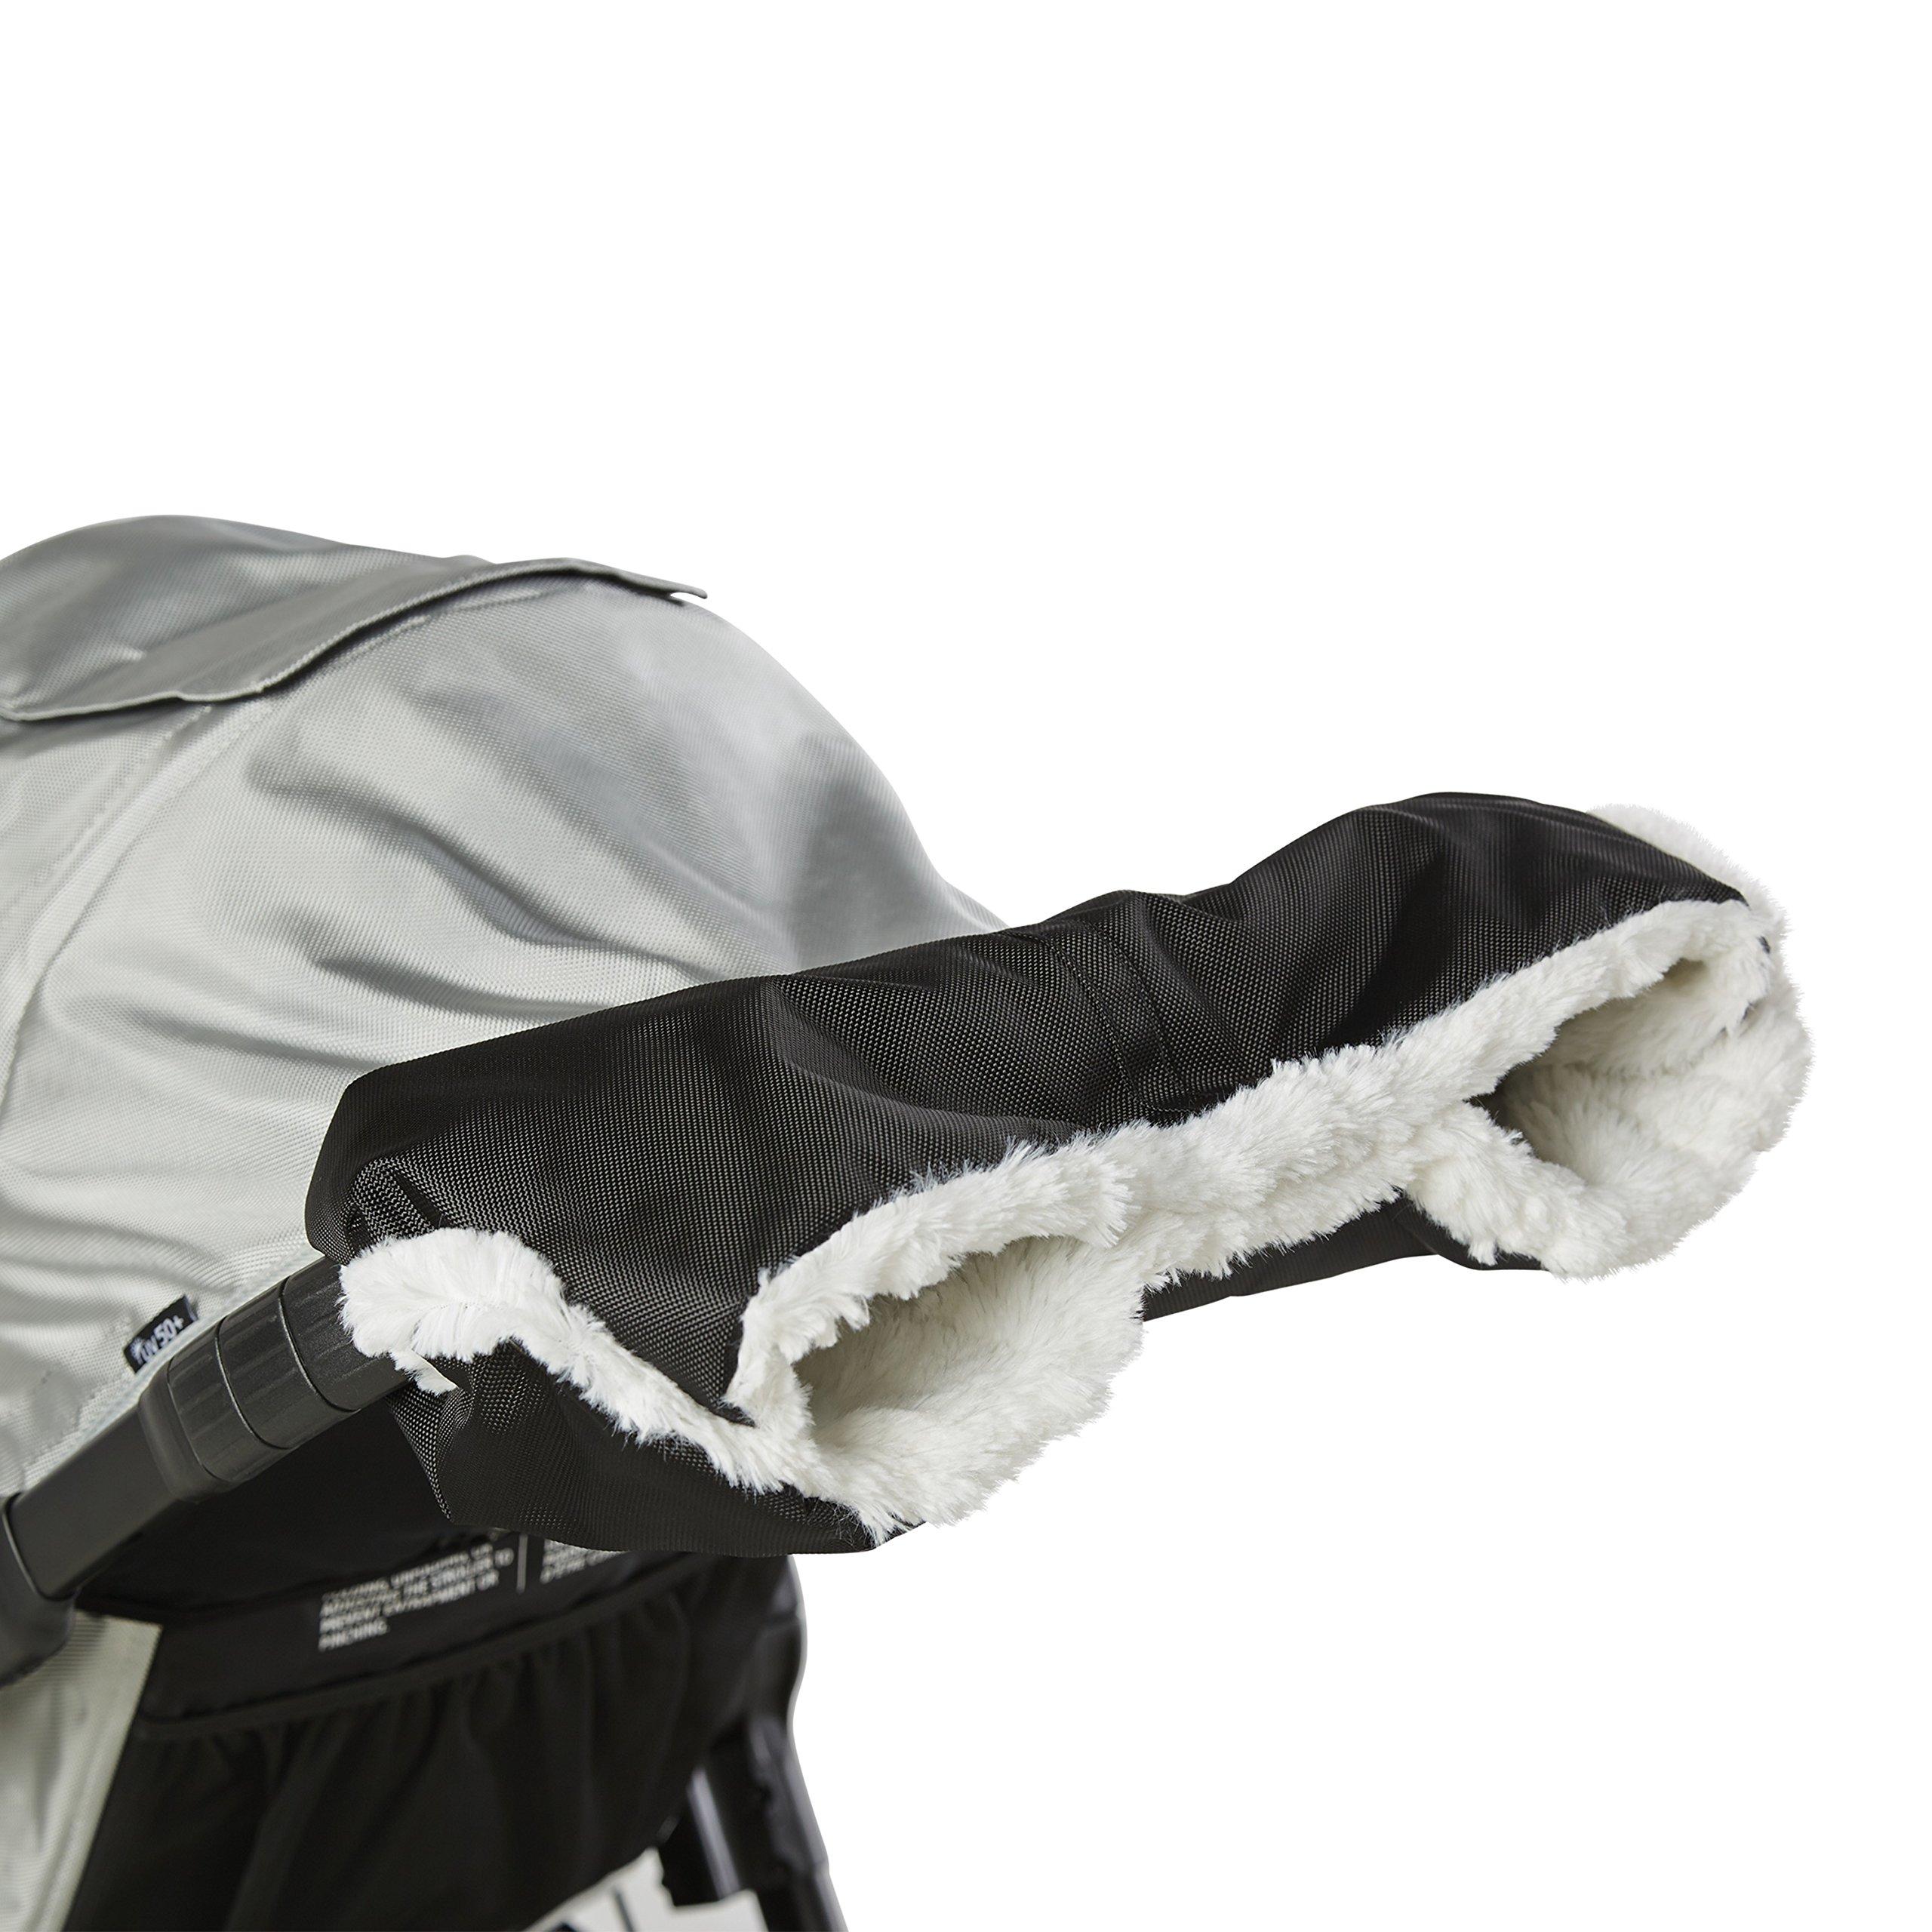 Baby Jogger Plush Stroller Hand Muff - Black Stroller Accessory